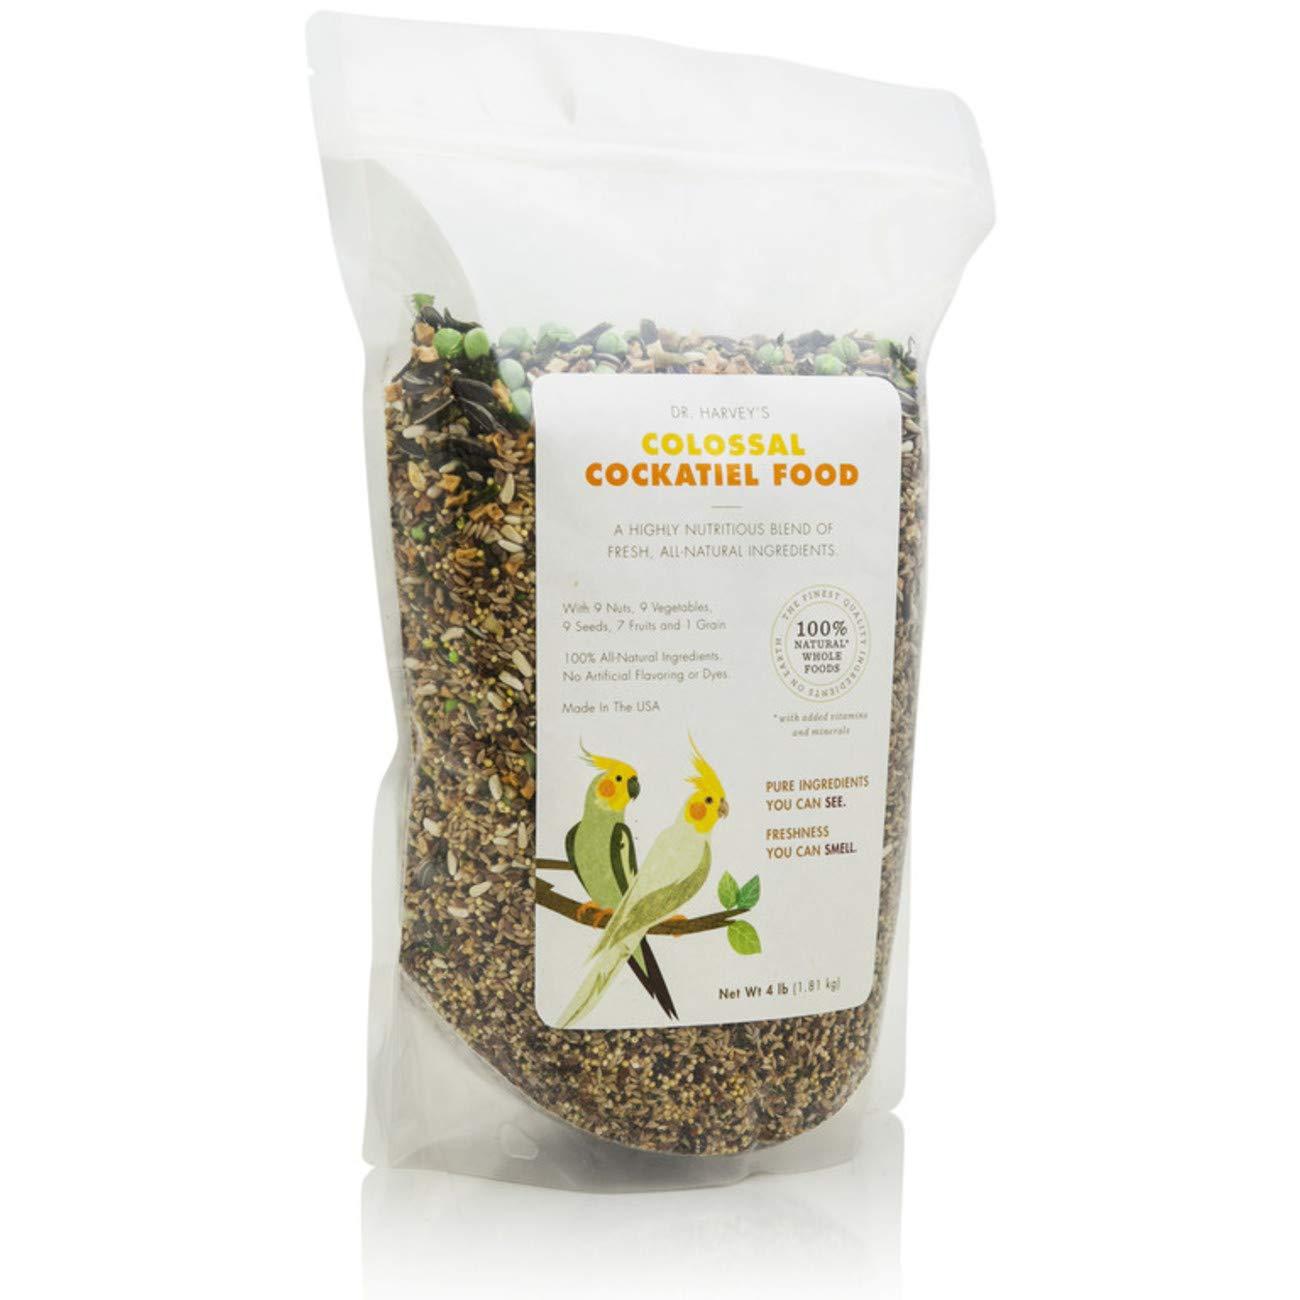 Dr. Harvey's Colossal Blend Natural Food for Cockatiels, 2-Pound Bag